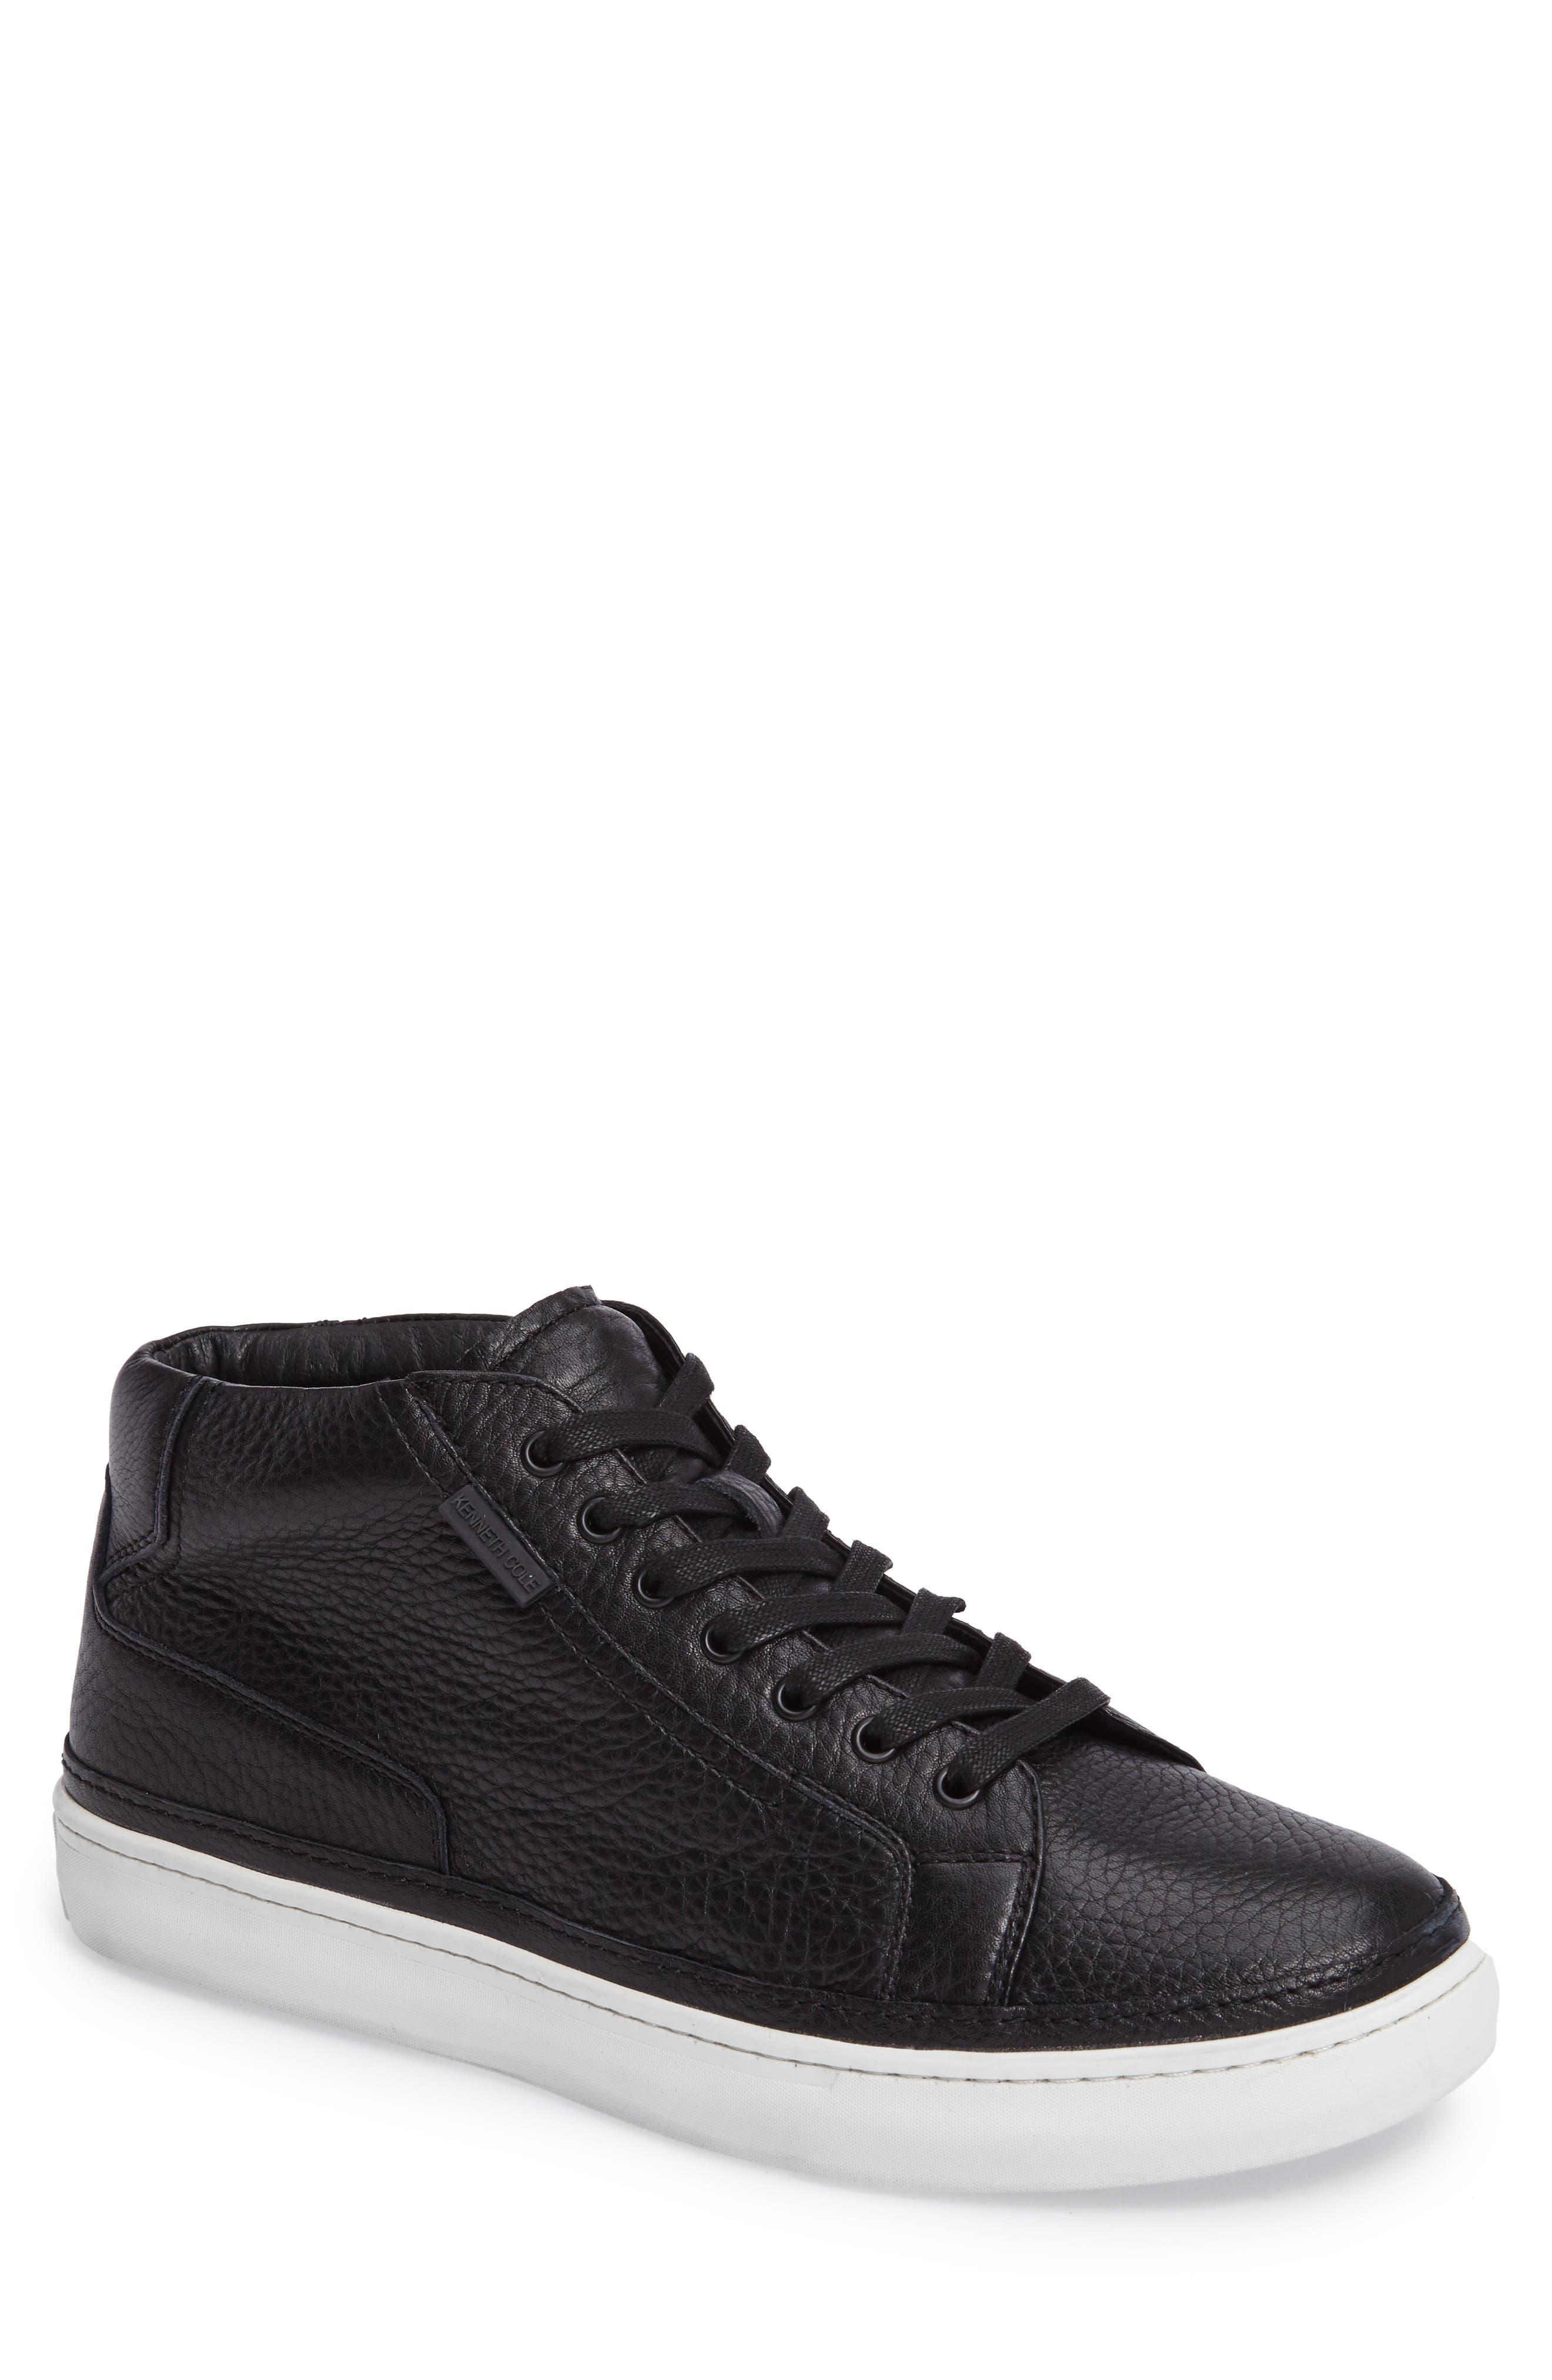 Seize the Moment Sneaker,                         Main,                         color, 001